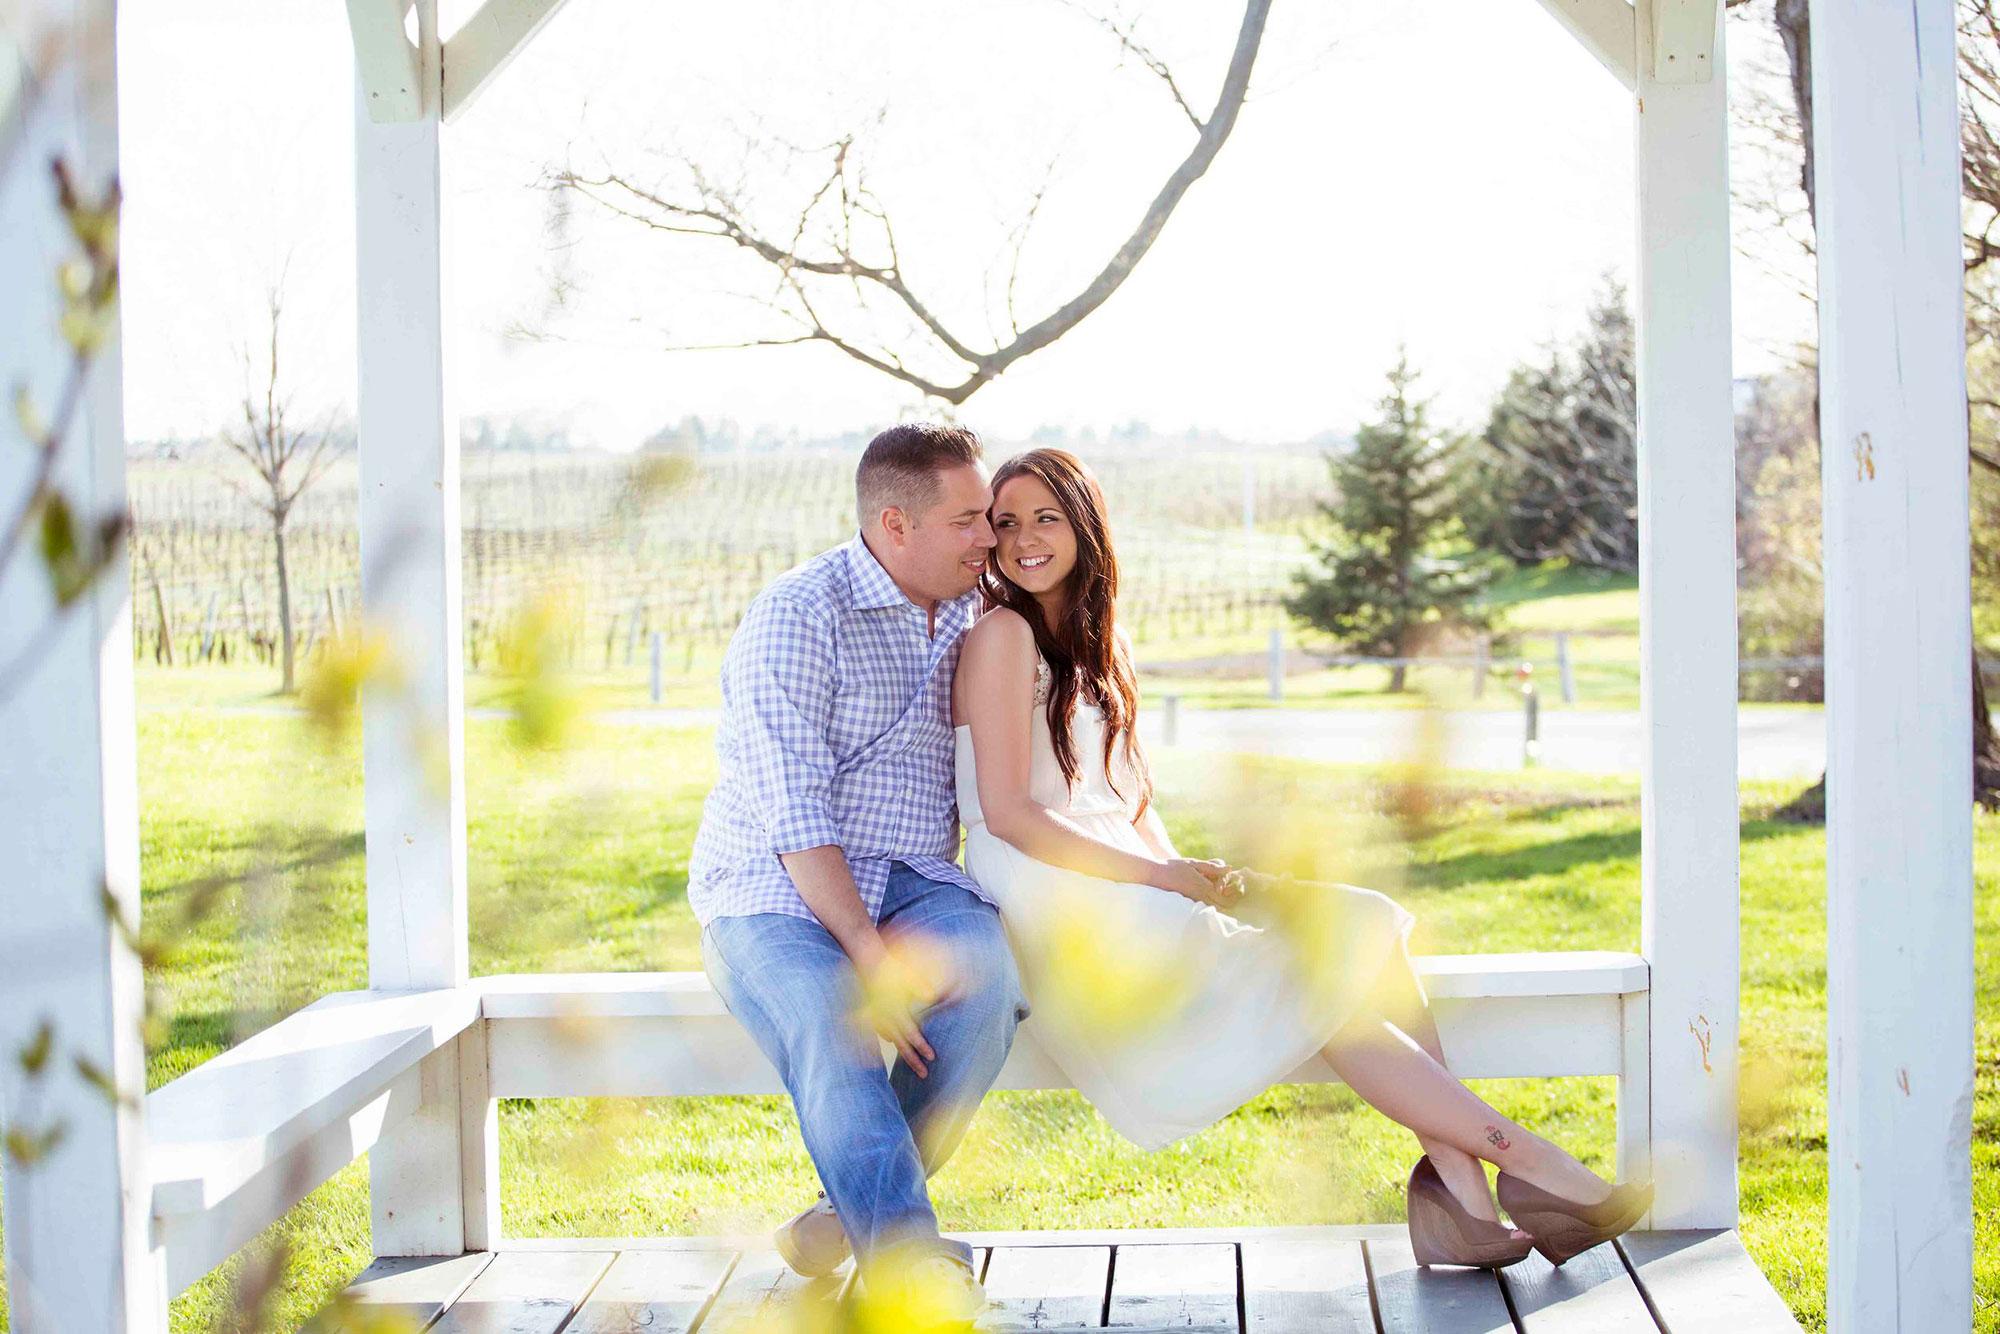 Niagara-on-the-Lake-Engagement-Vineyard-Bride-Photo-By-Gemini-Photography-019.jpg